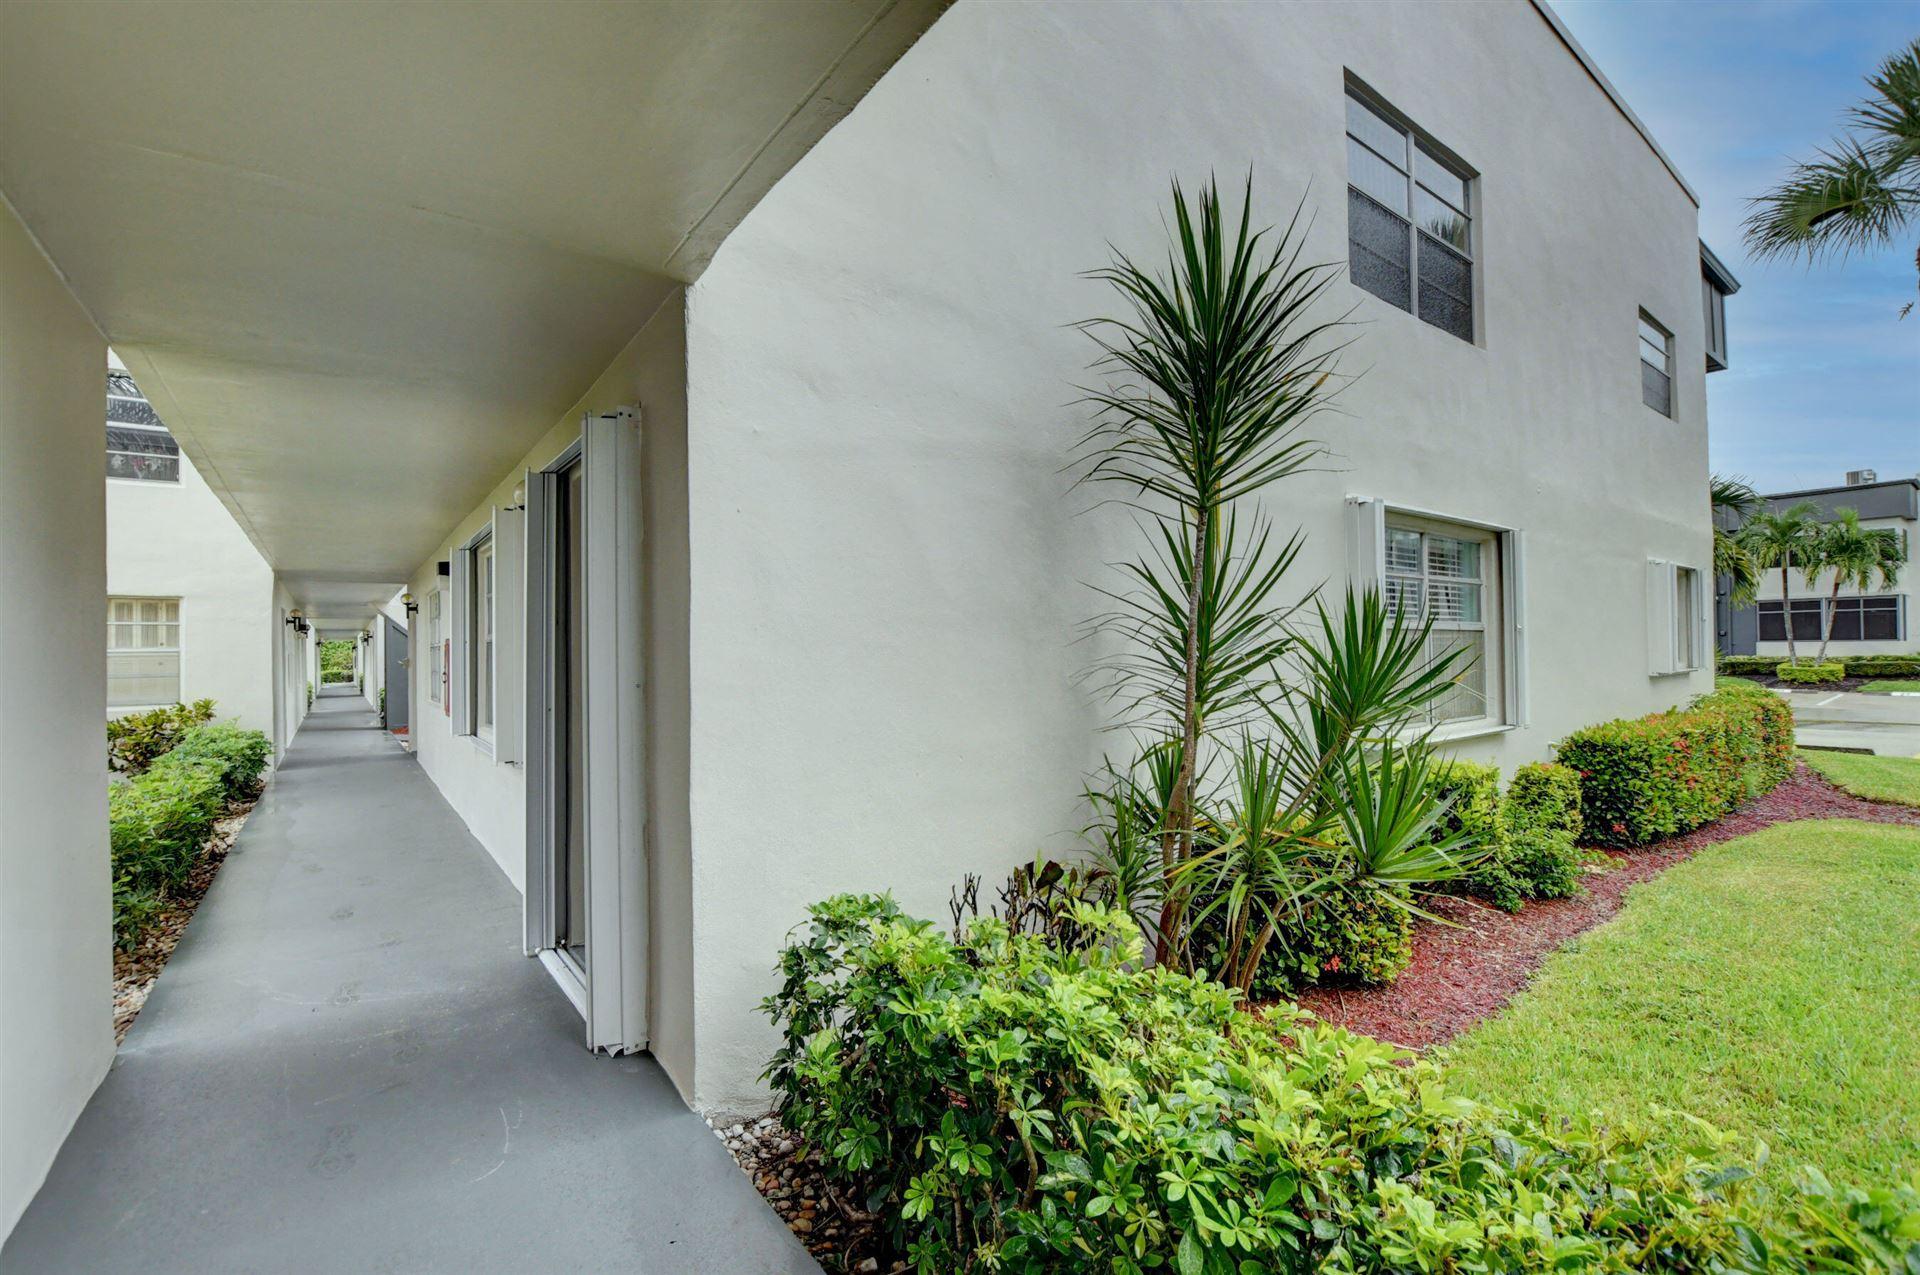 Photo of 303 Burgundy G, Delray Beach, FL 33484 (MLS # RX-10753864)